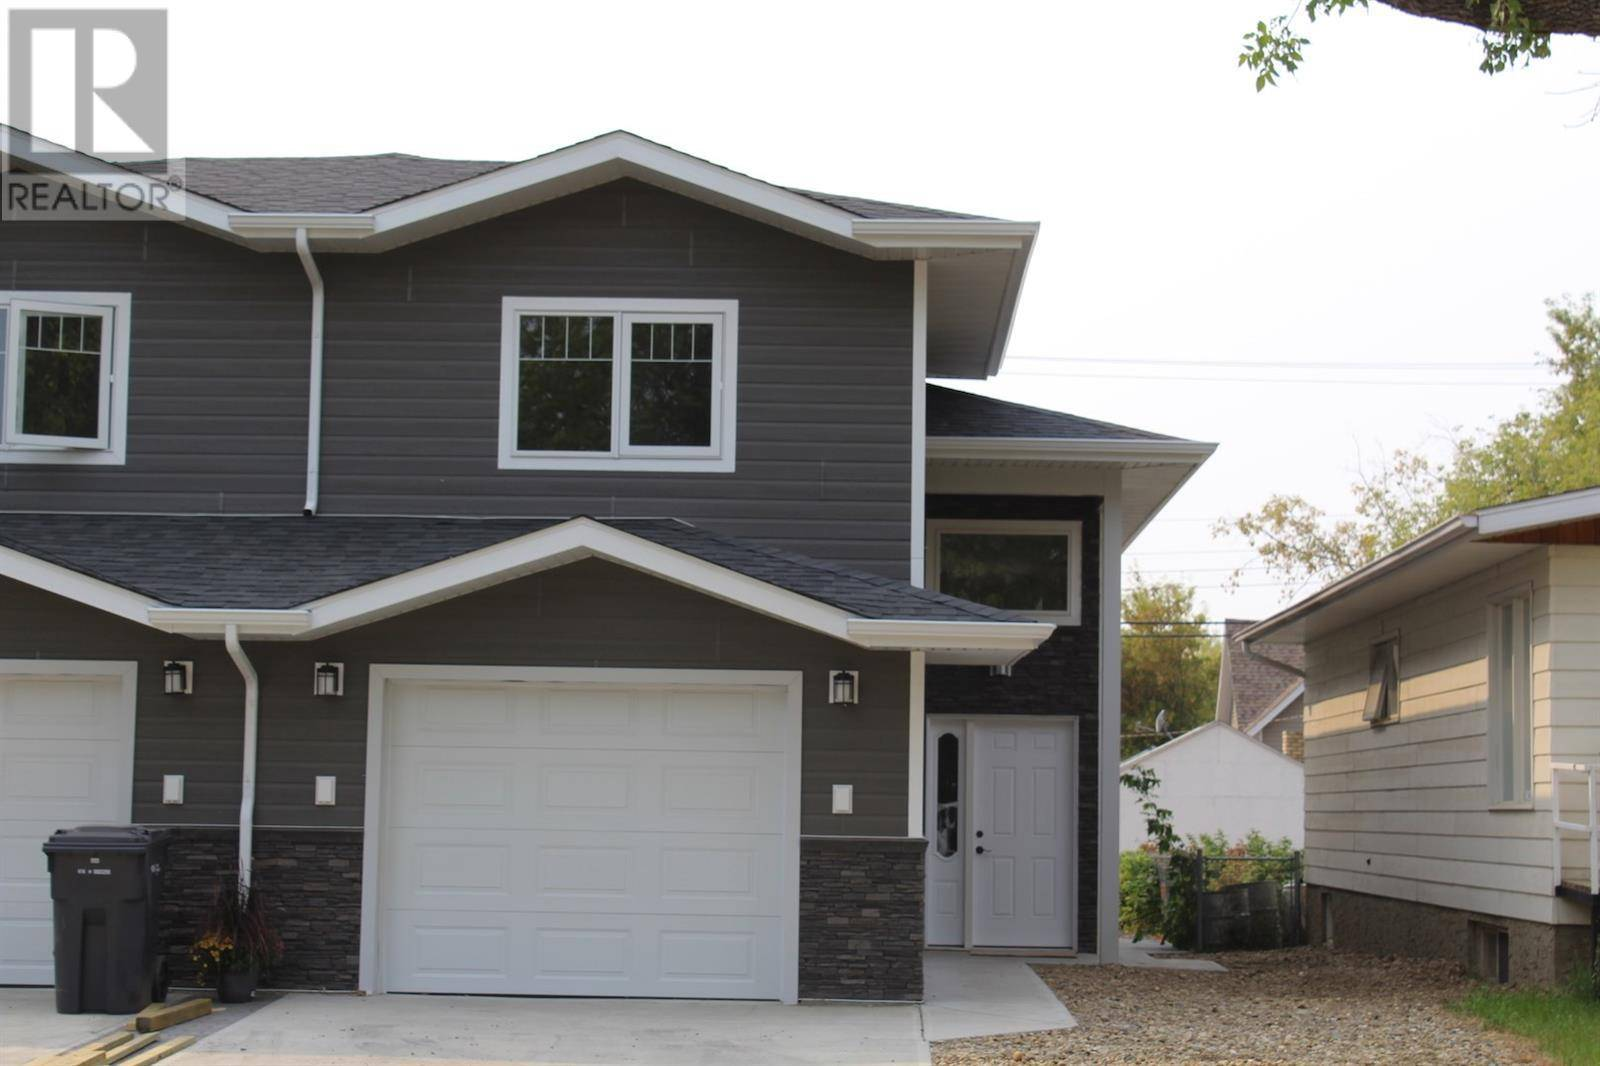 House for sale at 1471 103rd St Unit B North Battleford Saskatchewan - MLS: SK796626